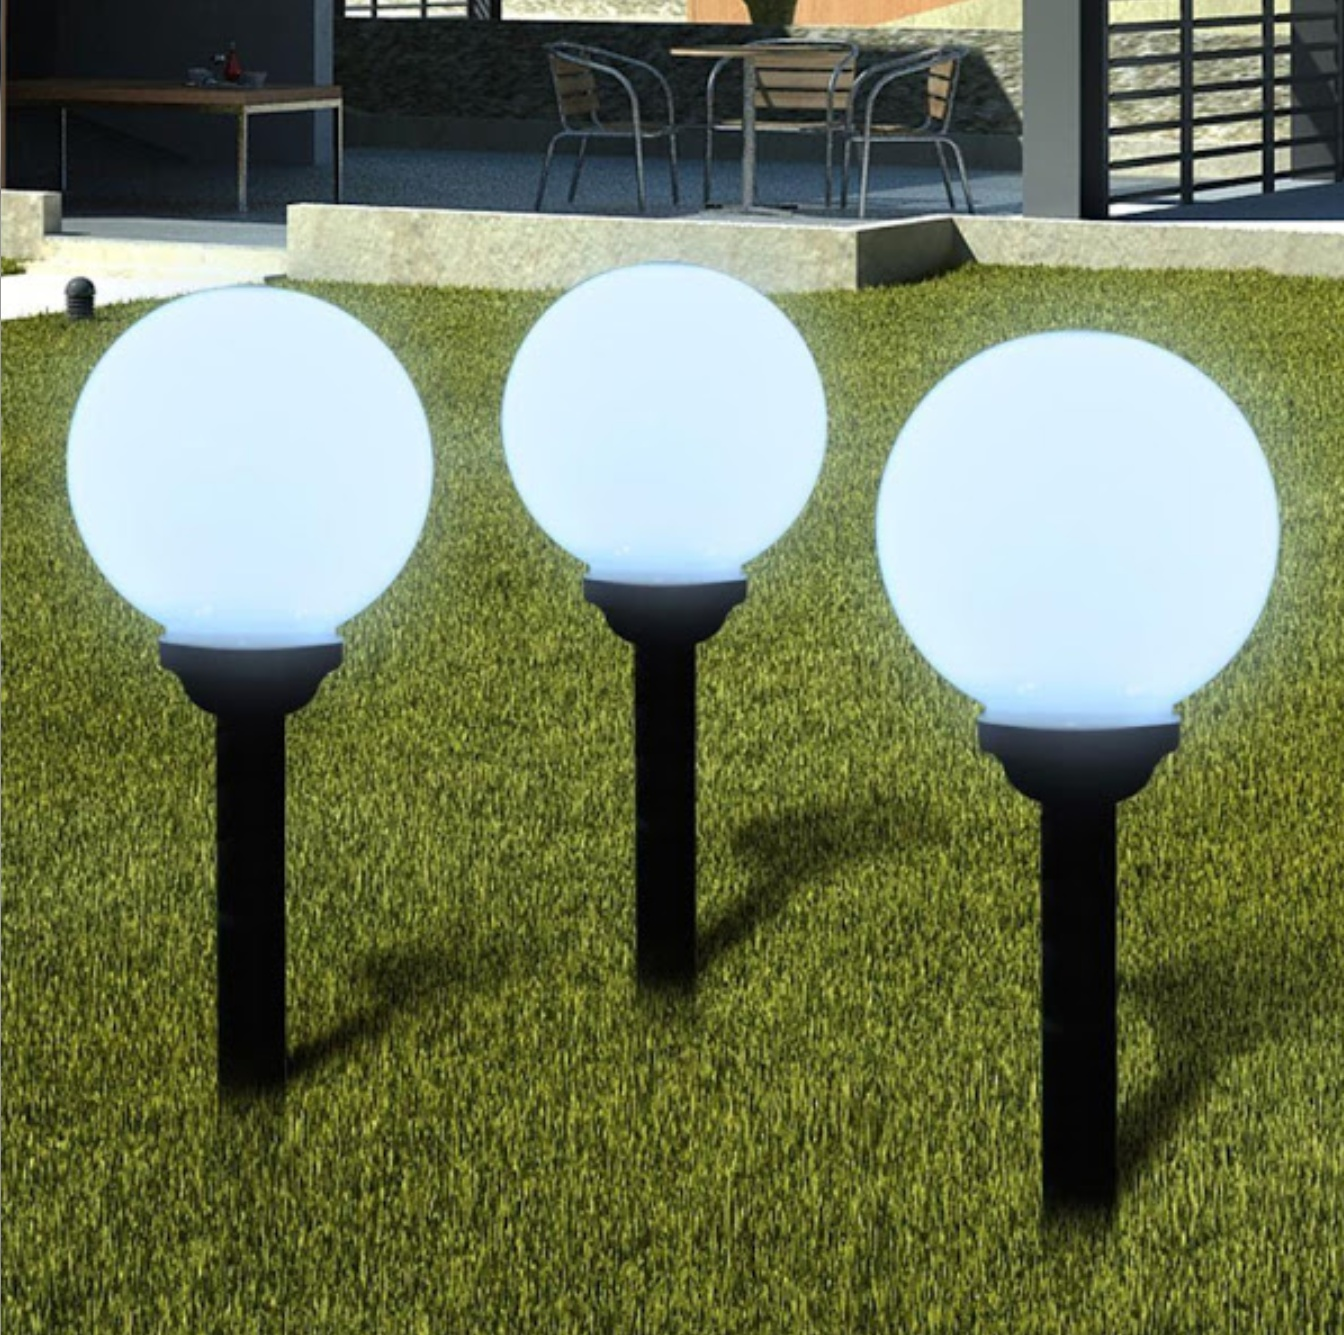 Set 3 x lampa solara cu senzor crepuscular, 4 LED, 37 cm, diametru 15 cm